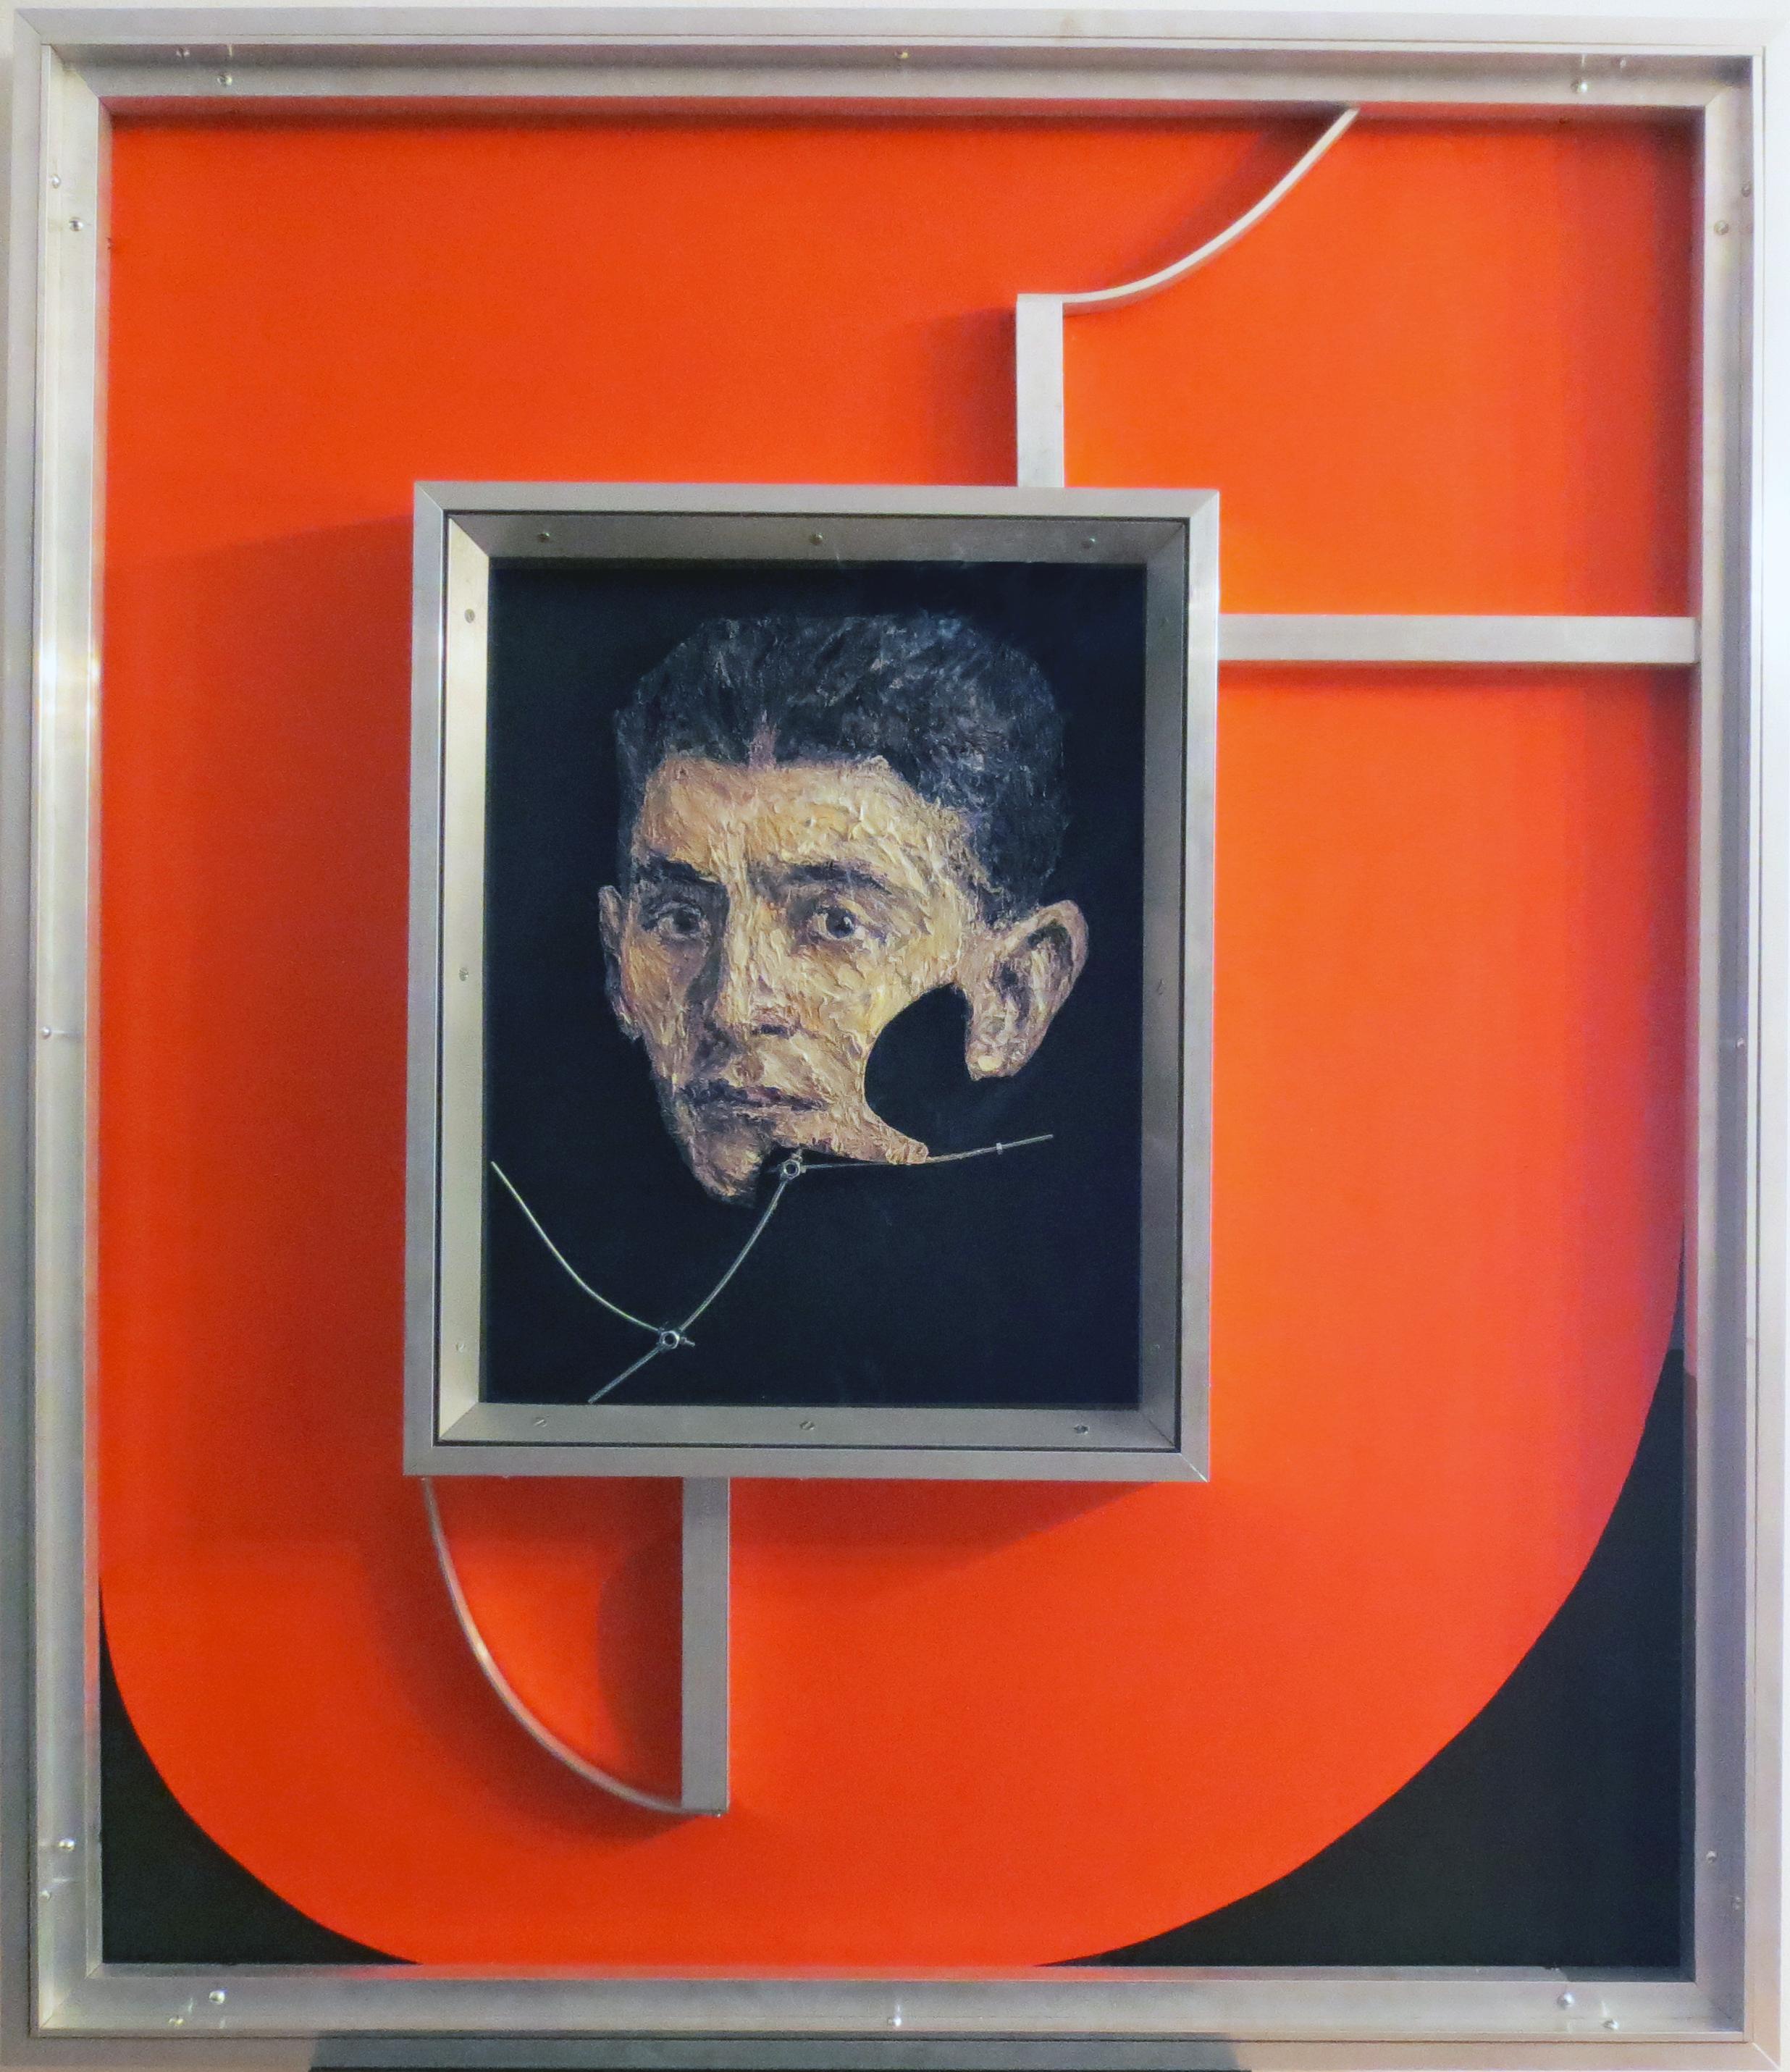 Aleksander Velišček, Franz Kafka  2017, mixed media, cm 111,5 x 95,5